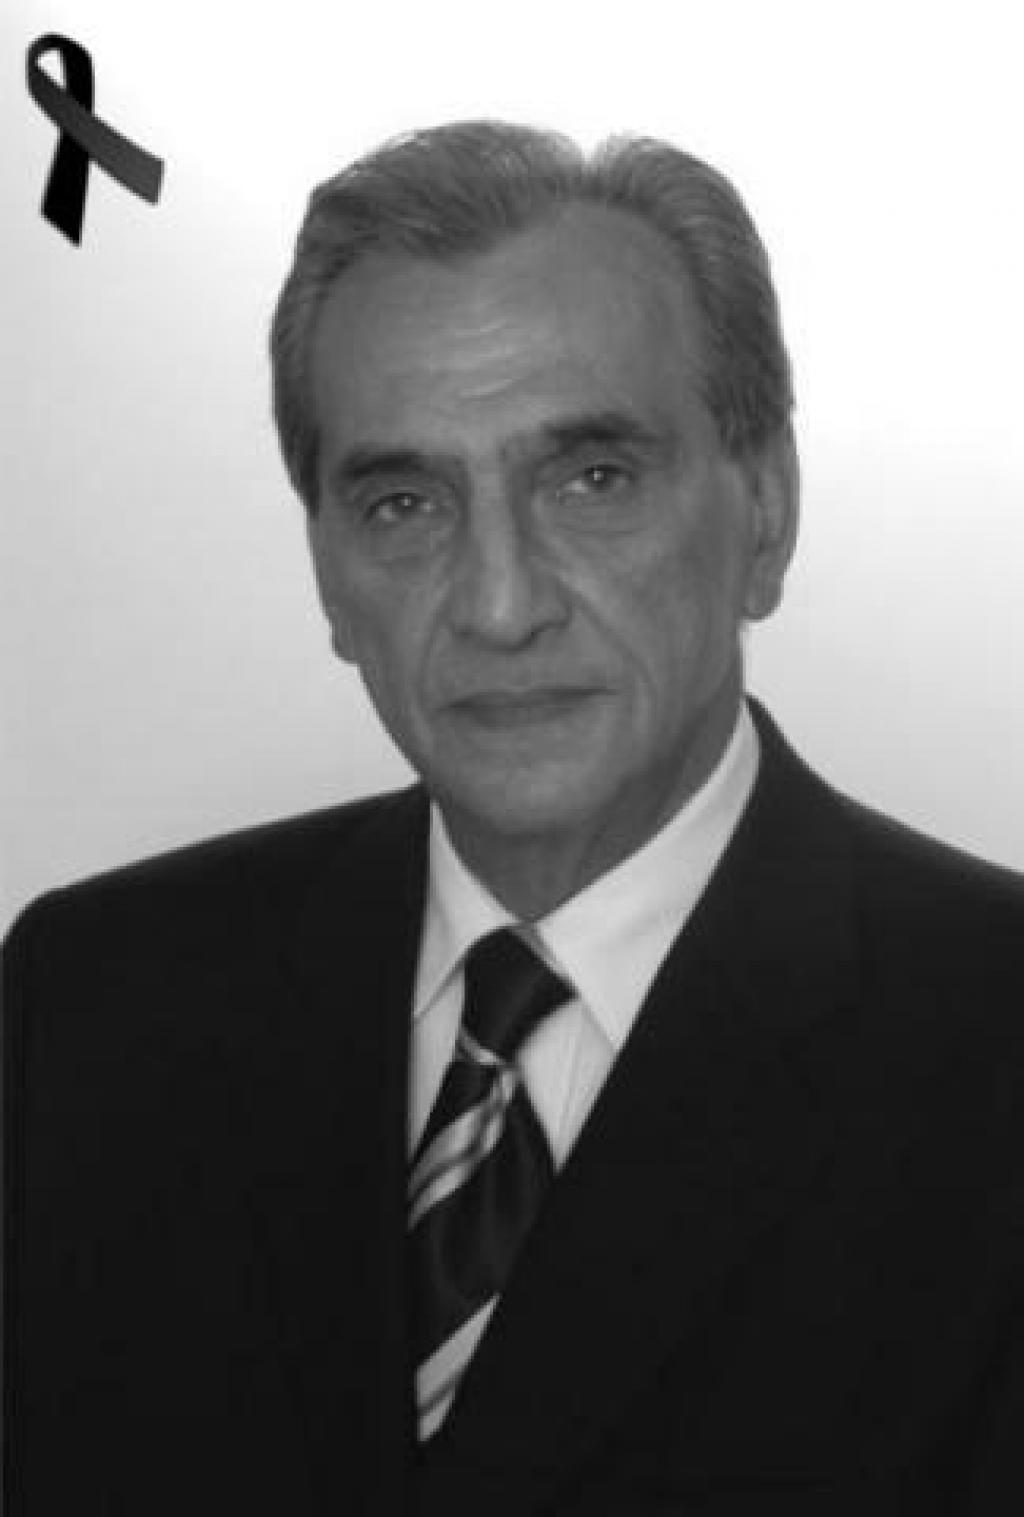 Józef Wisniewski passes away at the age of 70